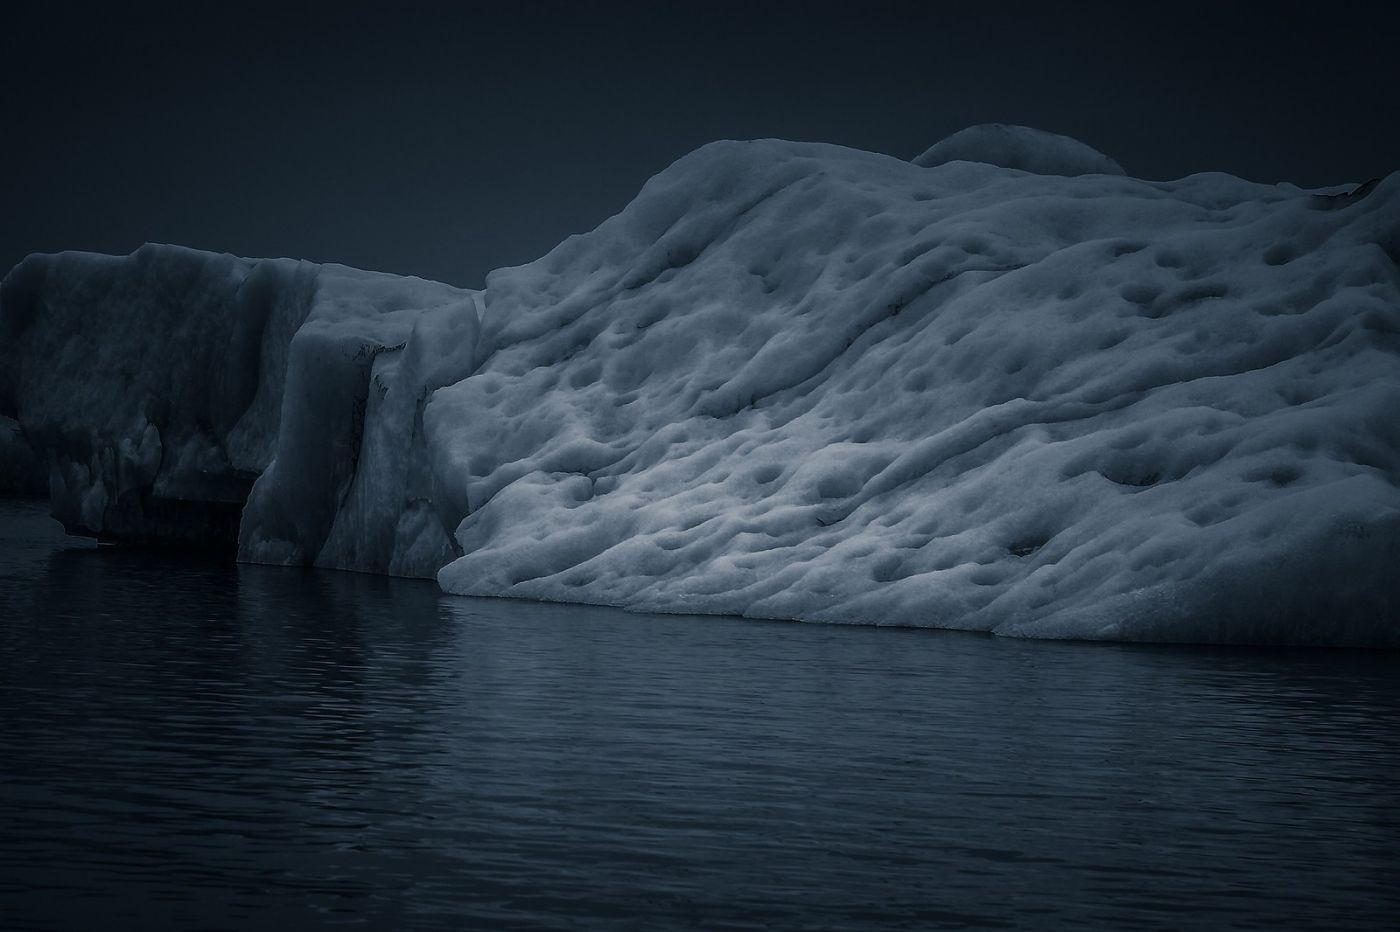 冰岛冰川泻湖(Glacier Lagoon),流动的冰川_图1-32